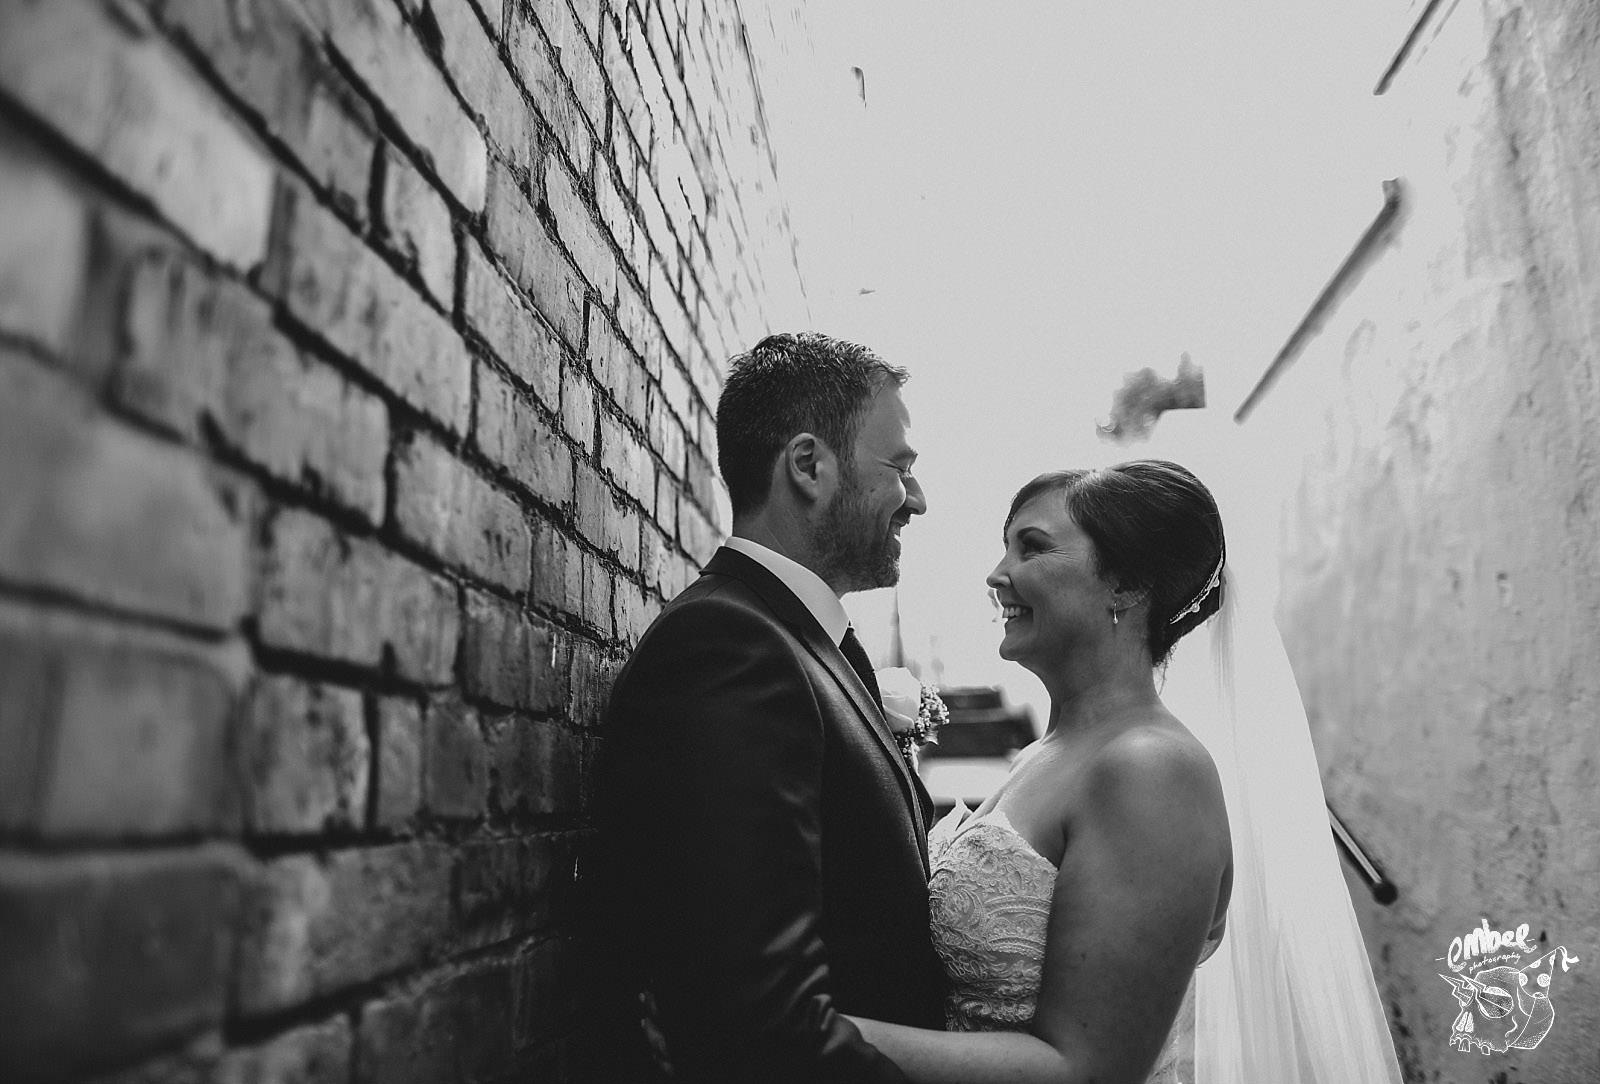 the belle époque bride and groom